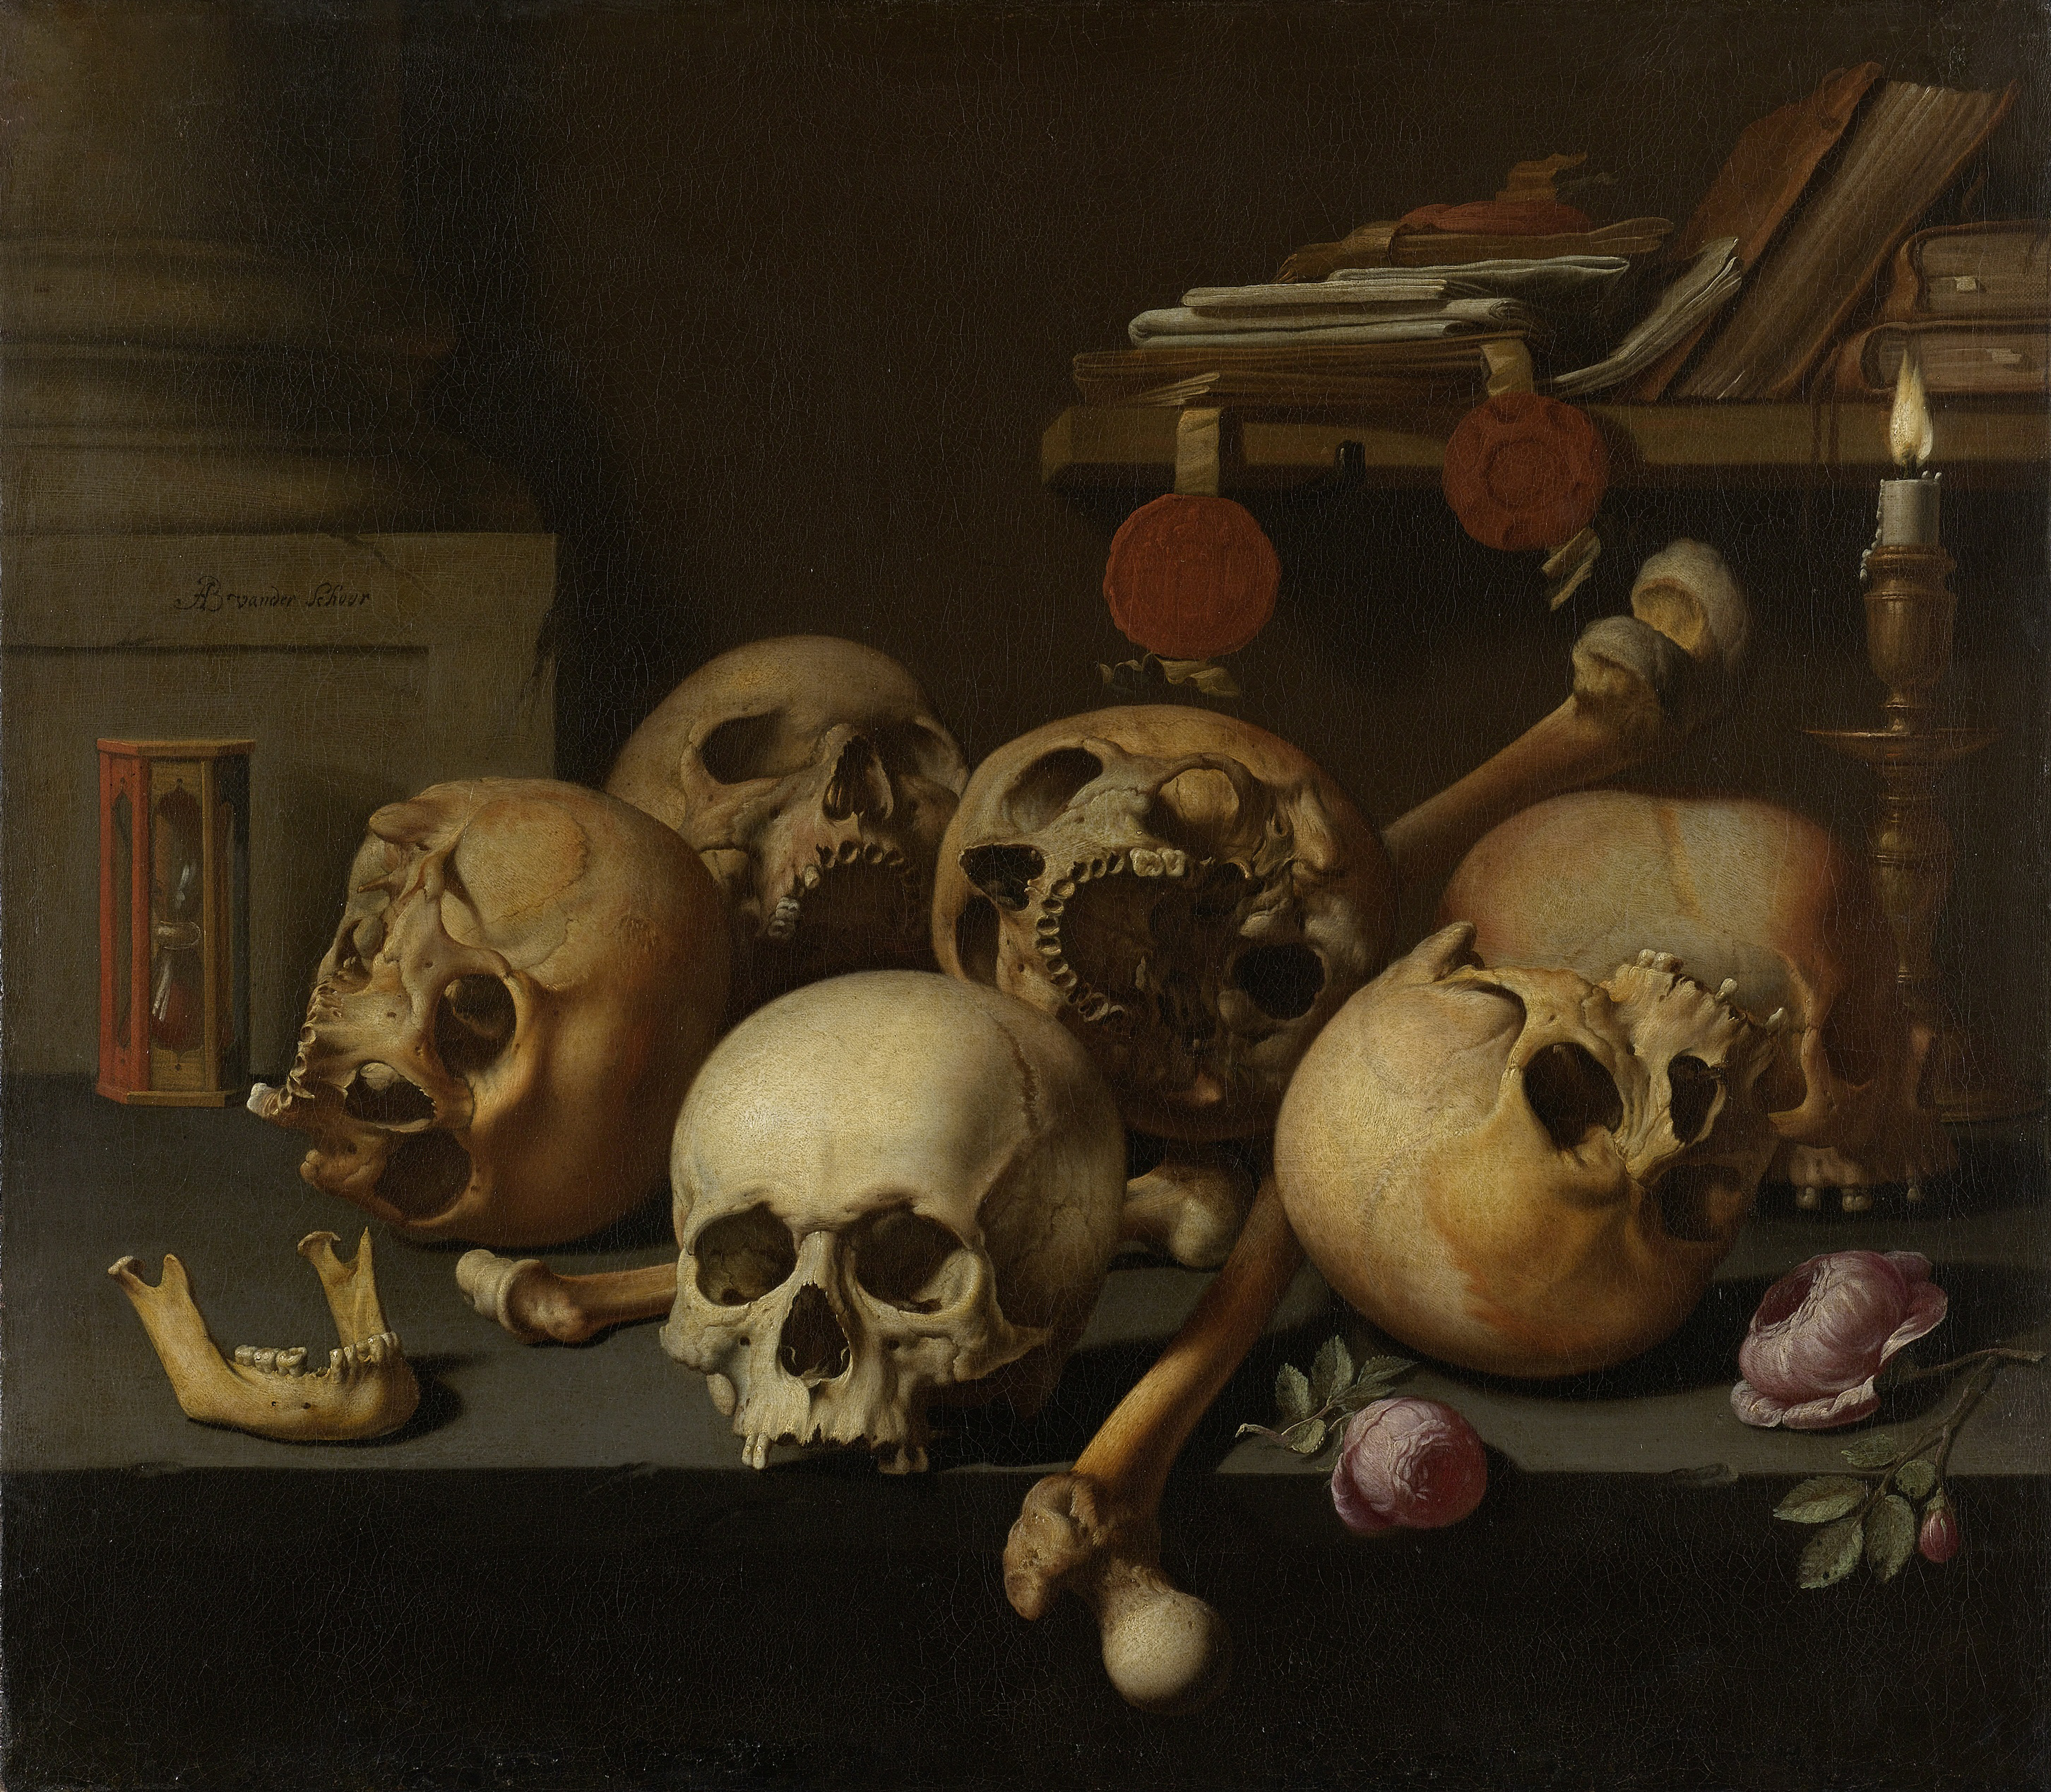 File:Vanitas stilleven Rijksmuseum SK-A-1342.jpeg